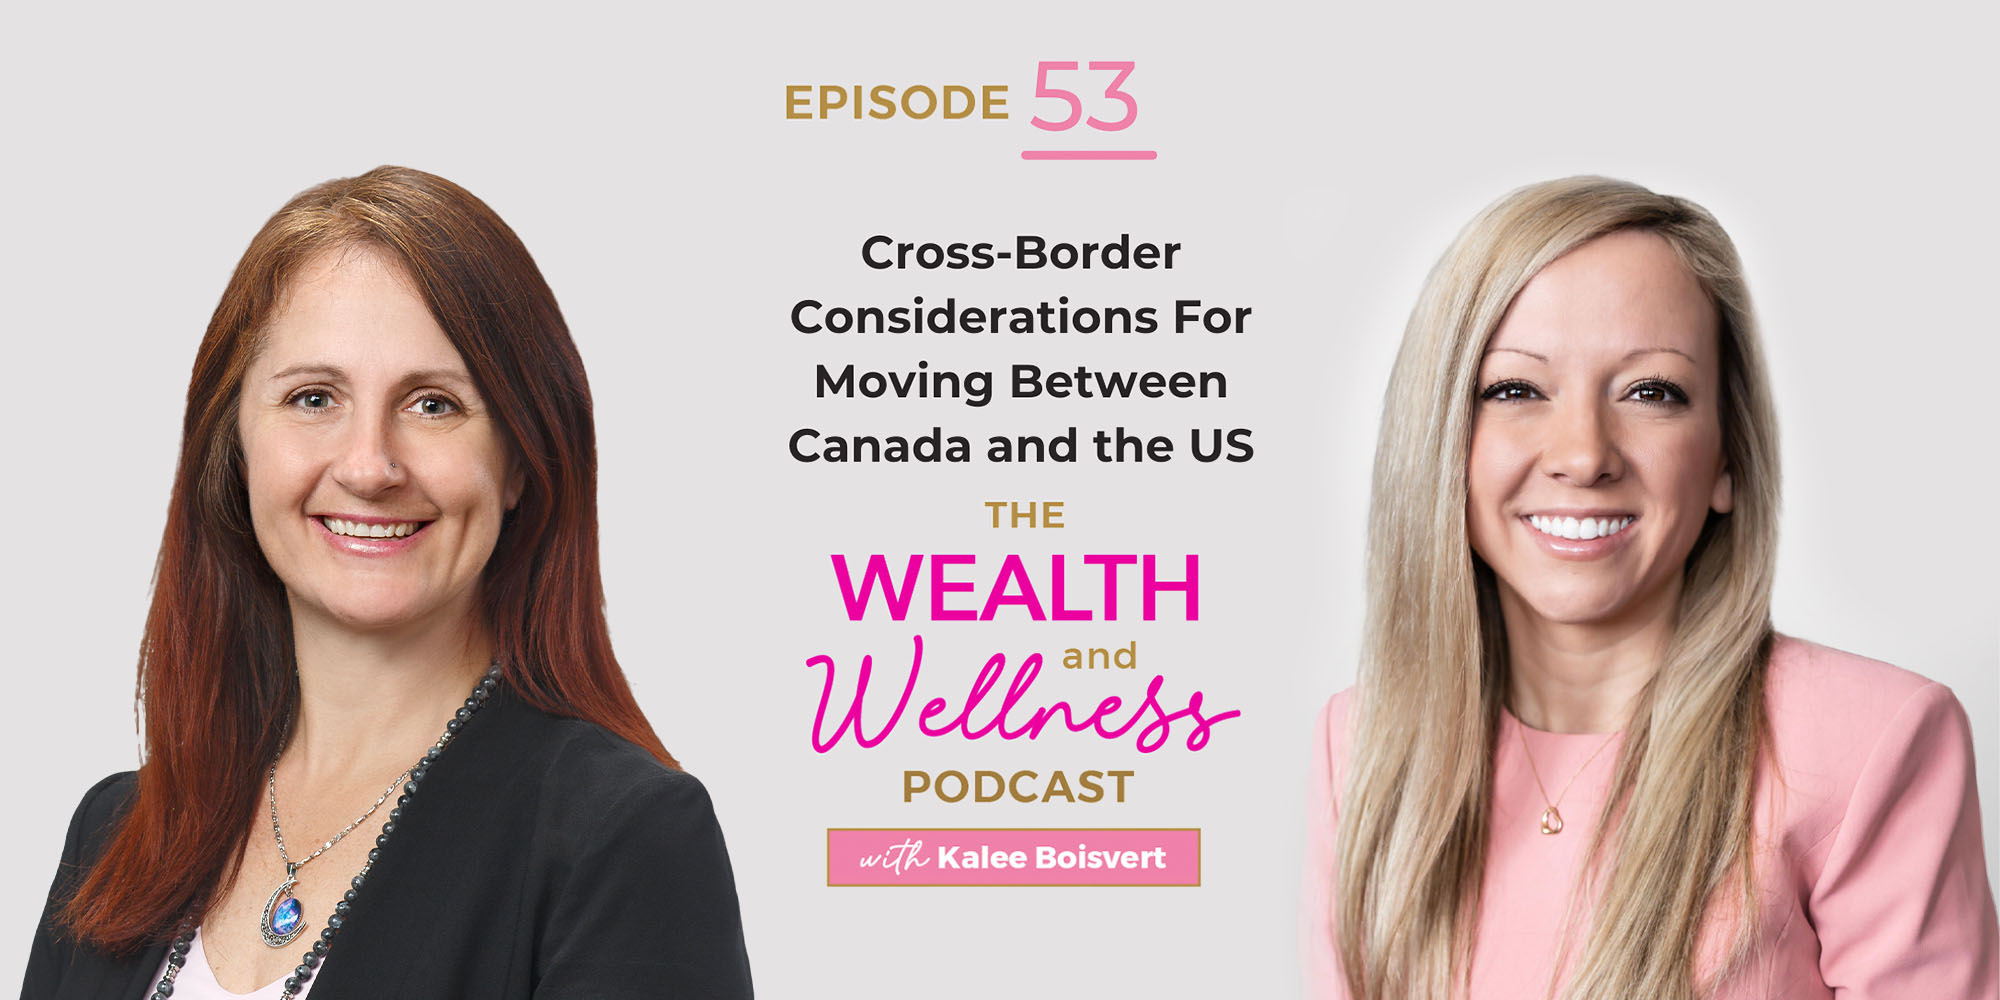 Krista Rabidoux on Wealth and Wellness podcast with Kalee Boisvert